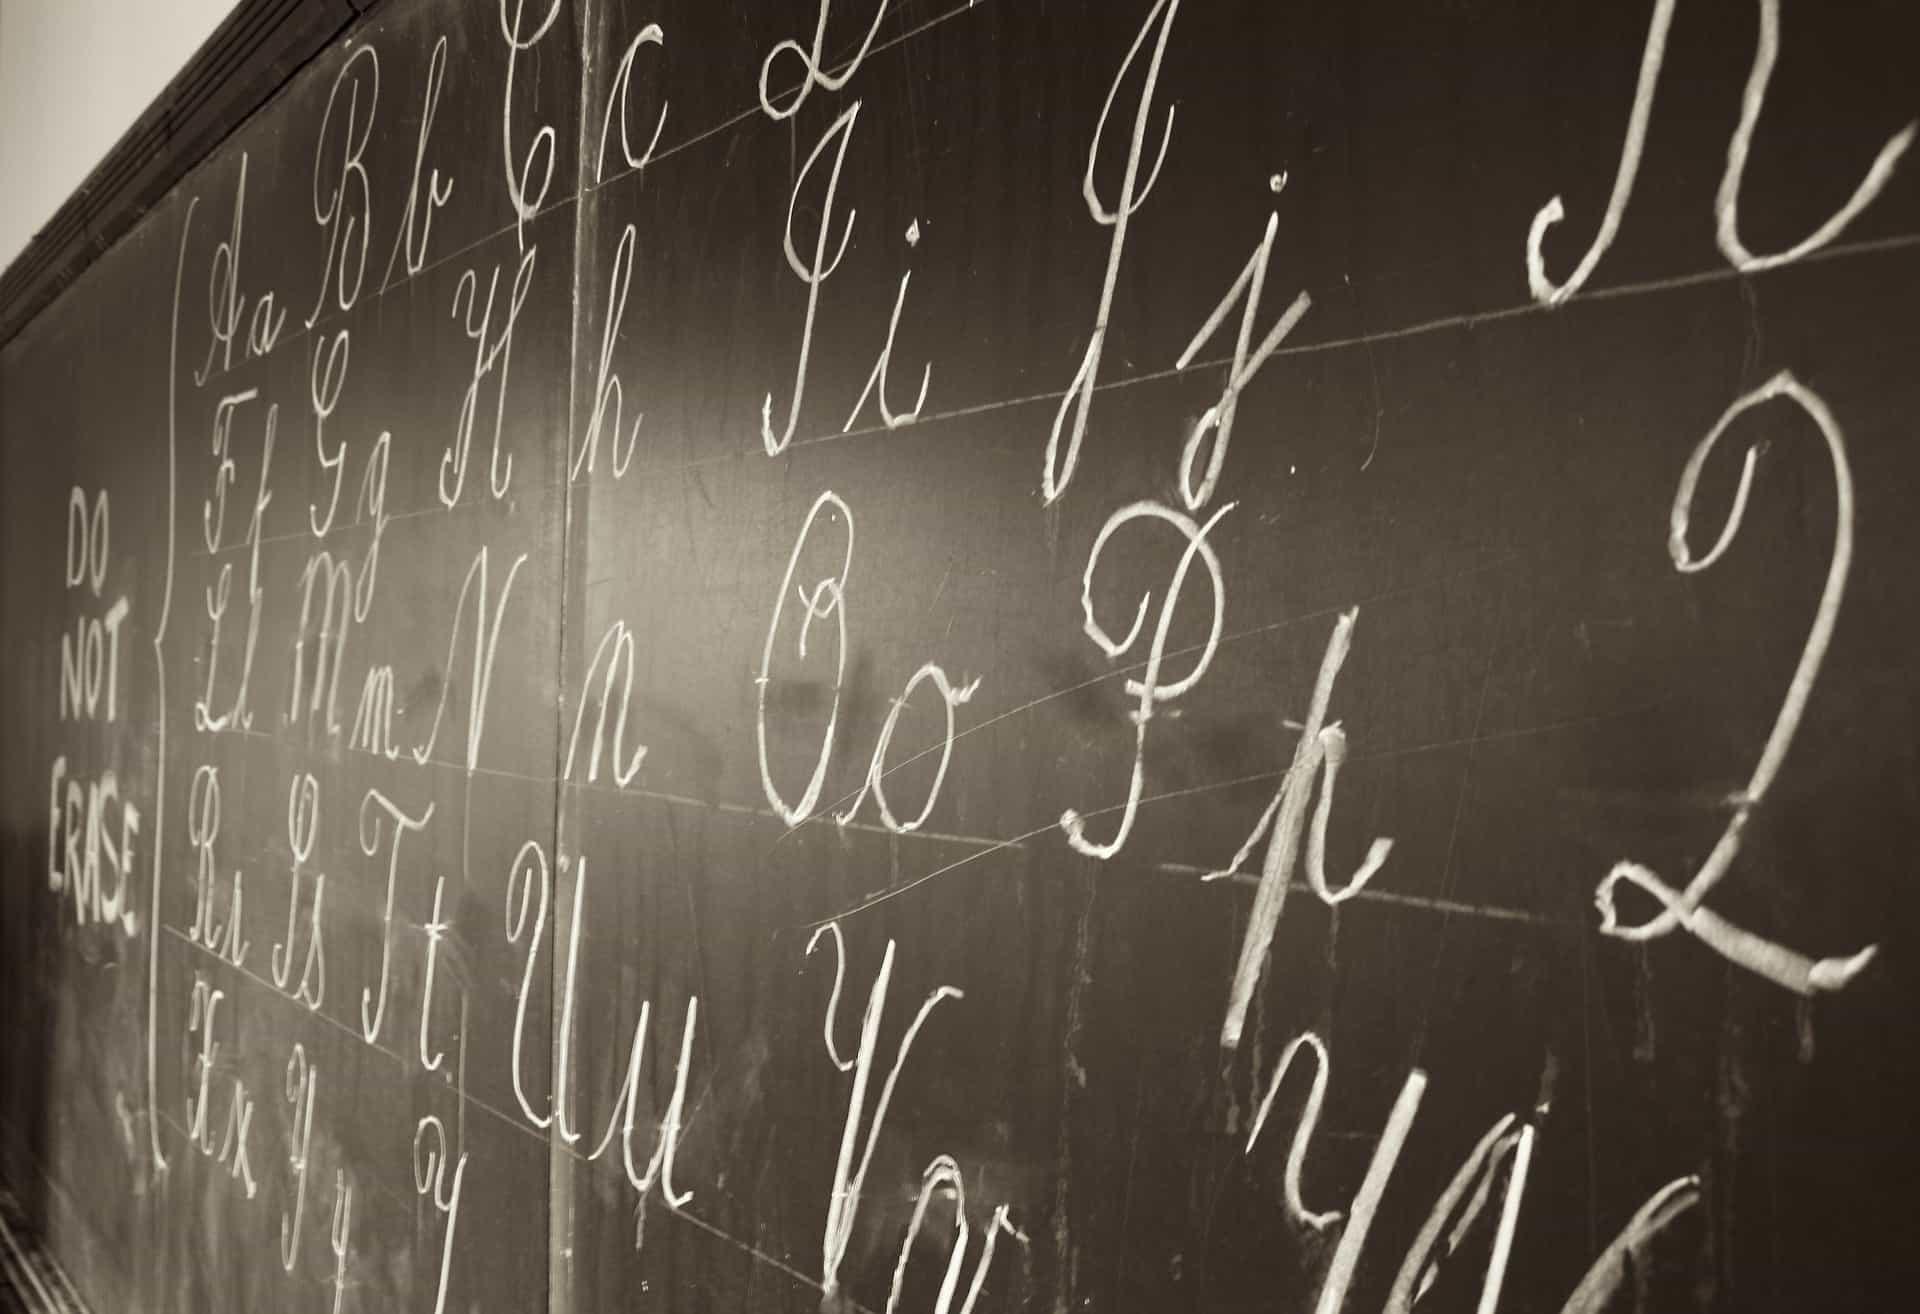 Higher education persuasive essay